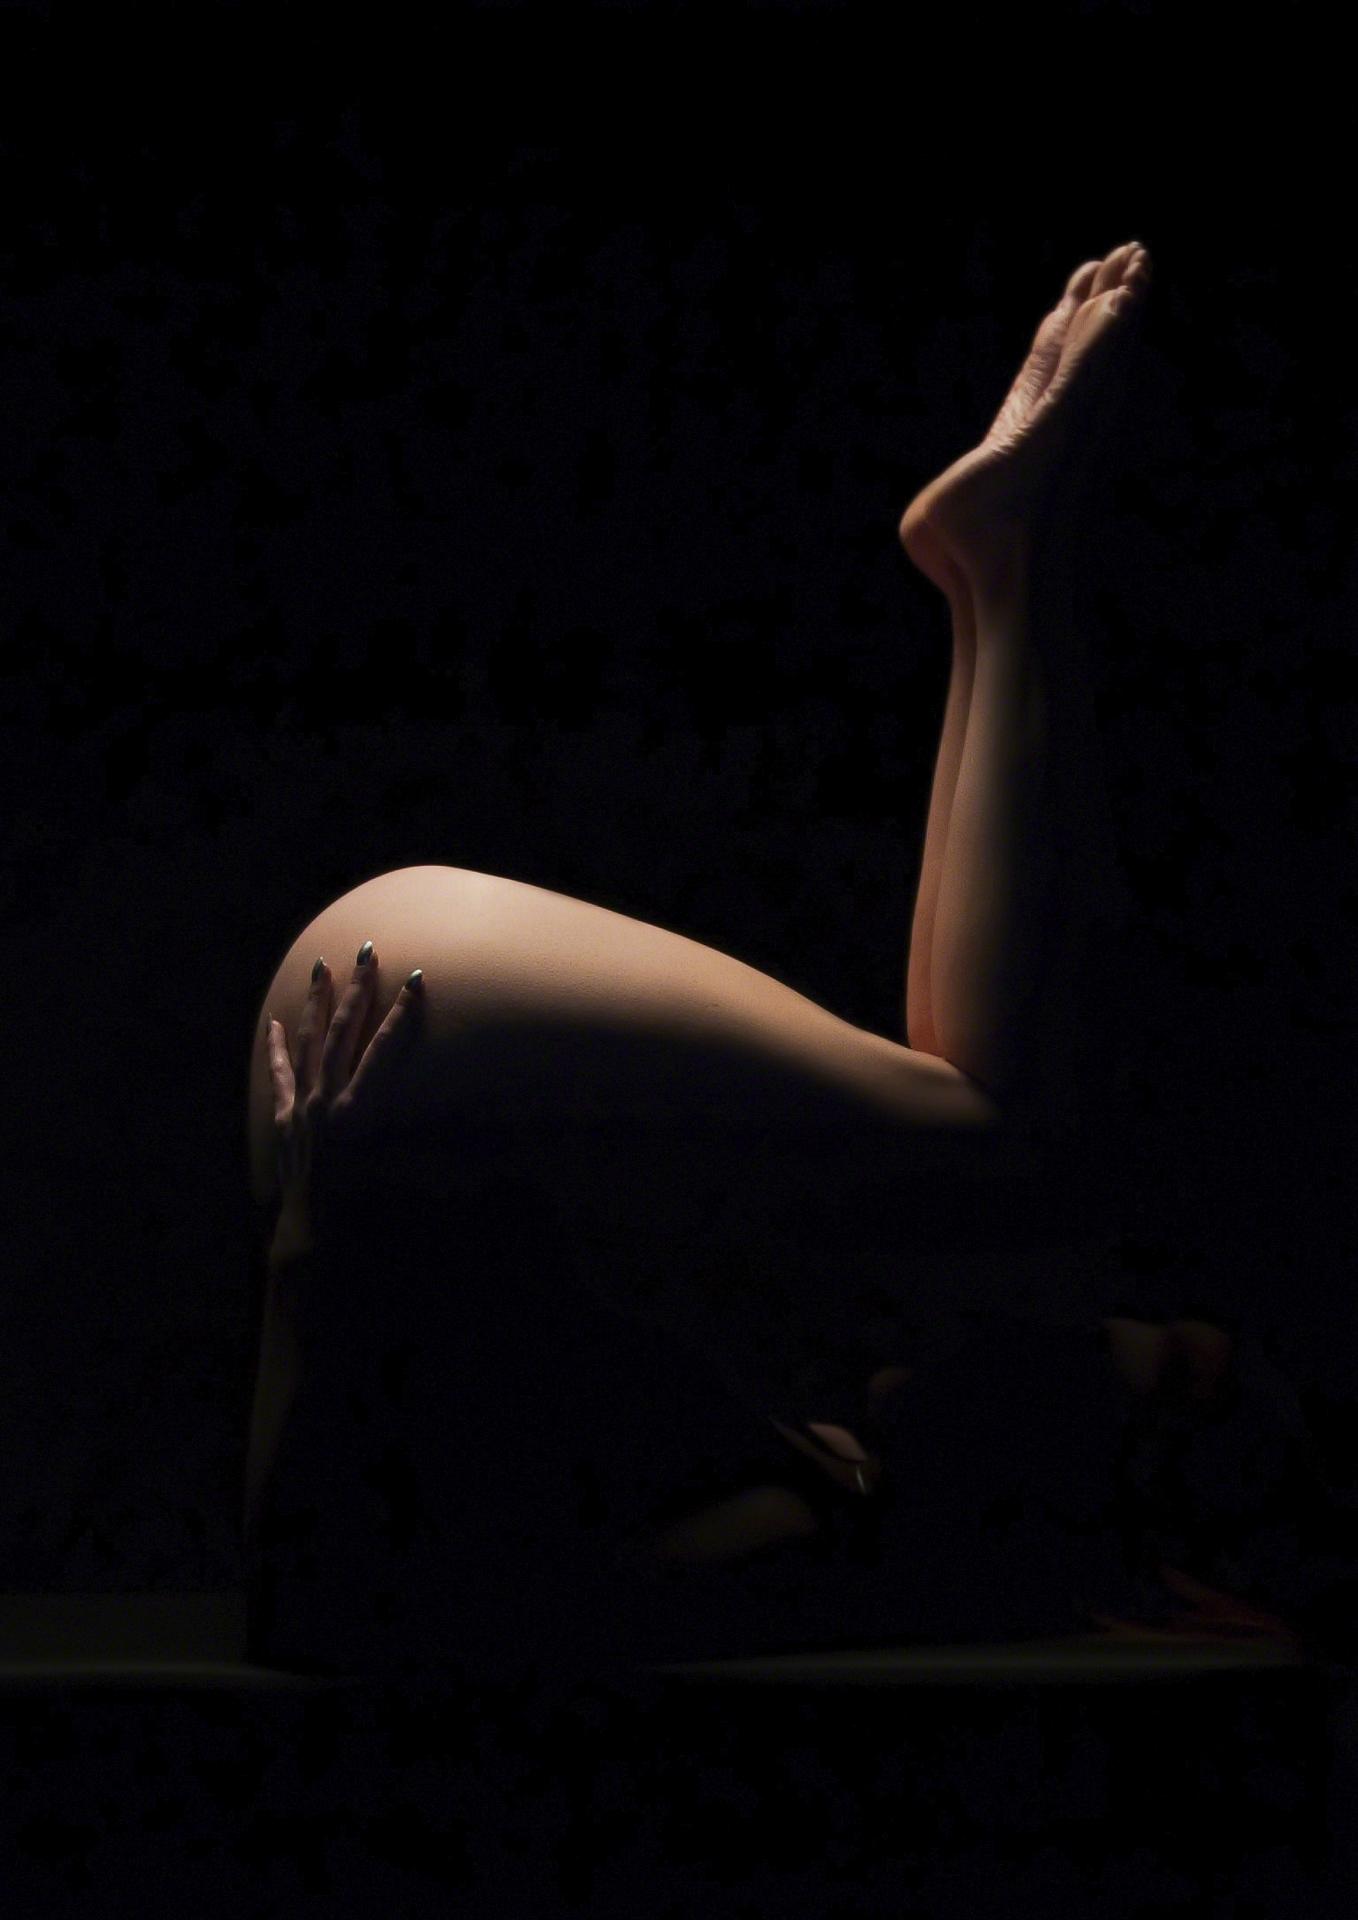 nude body art